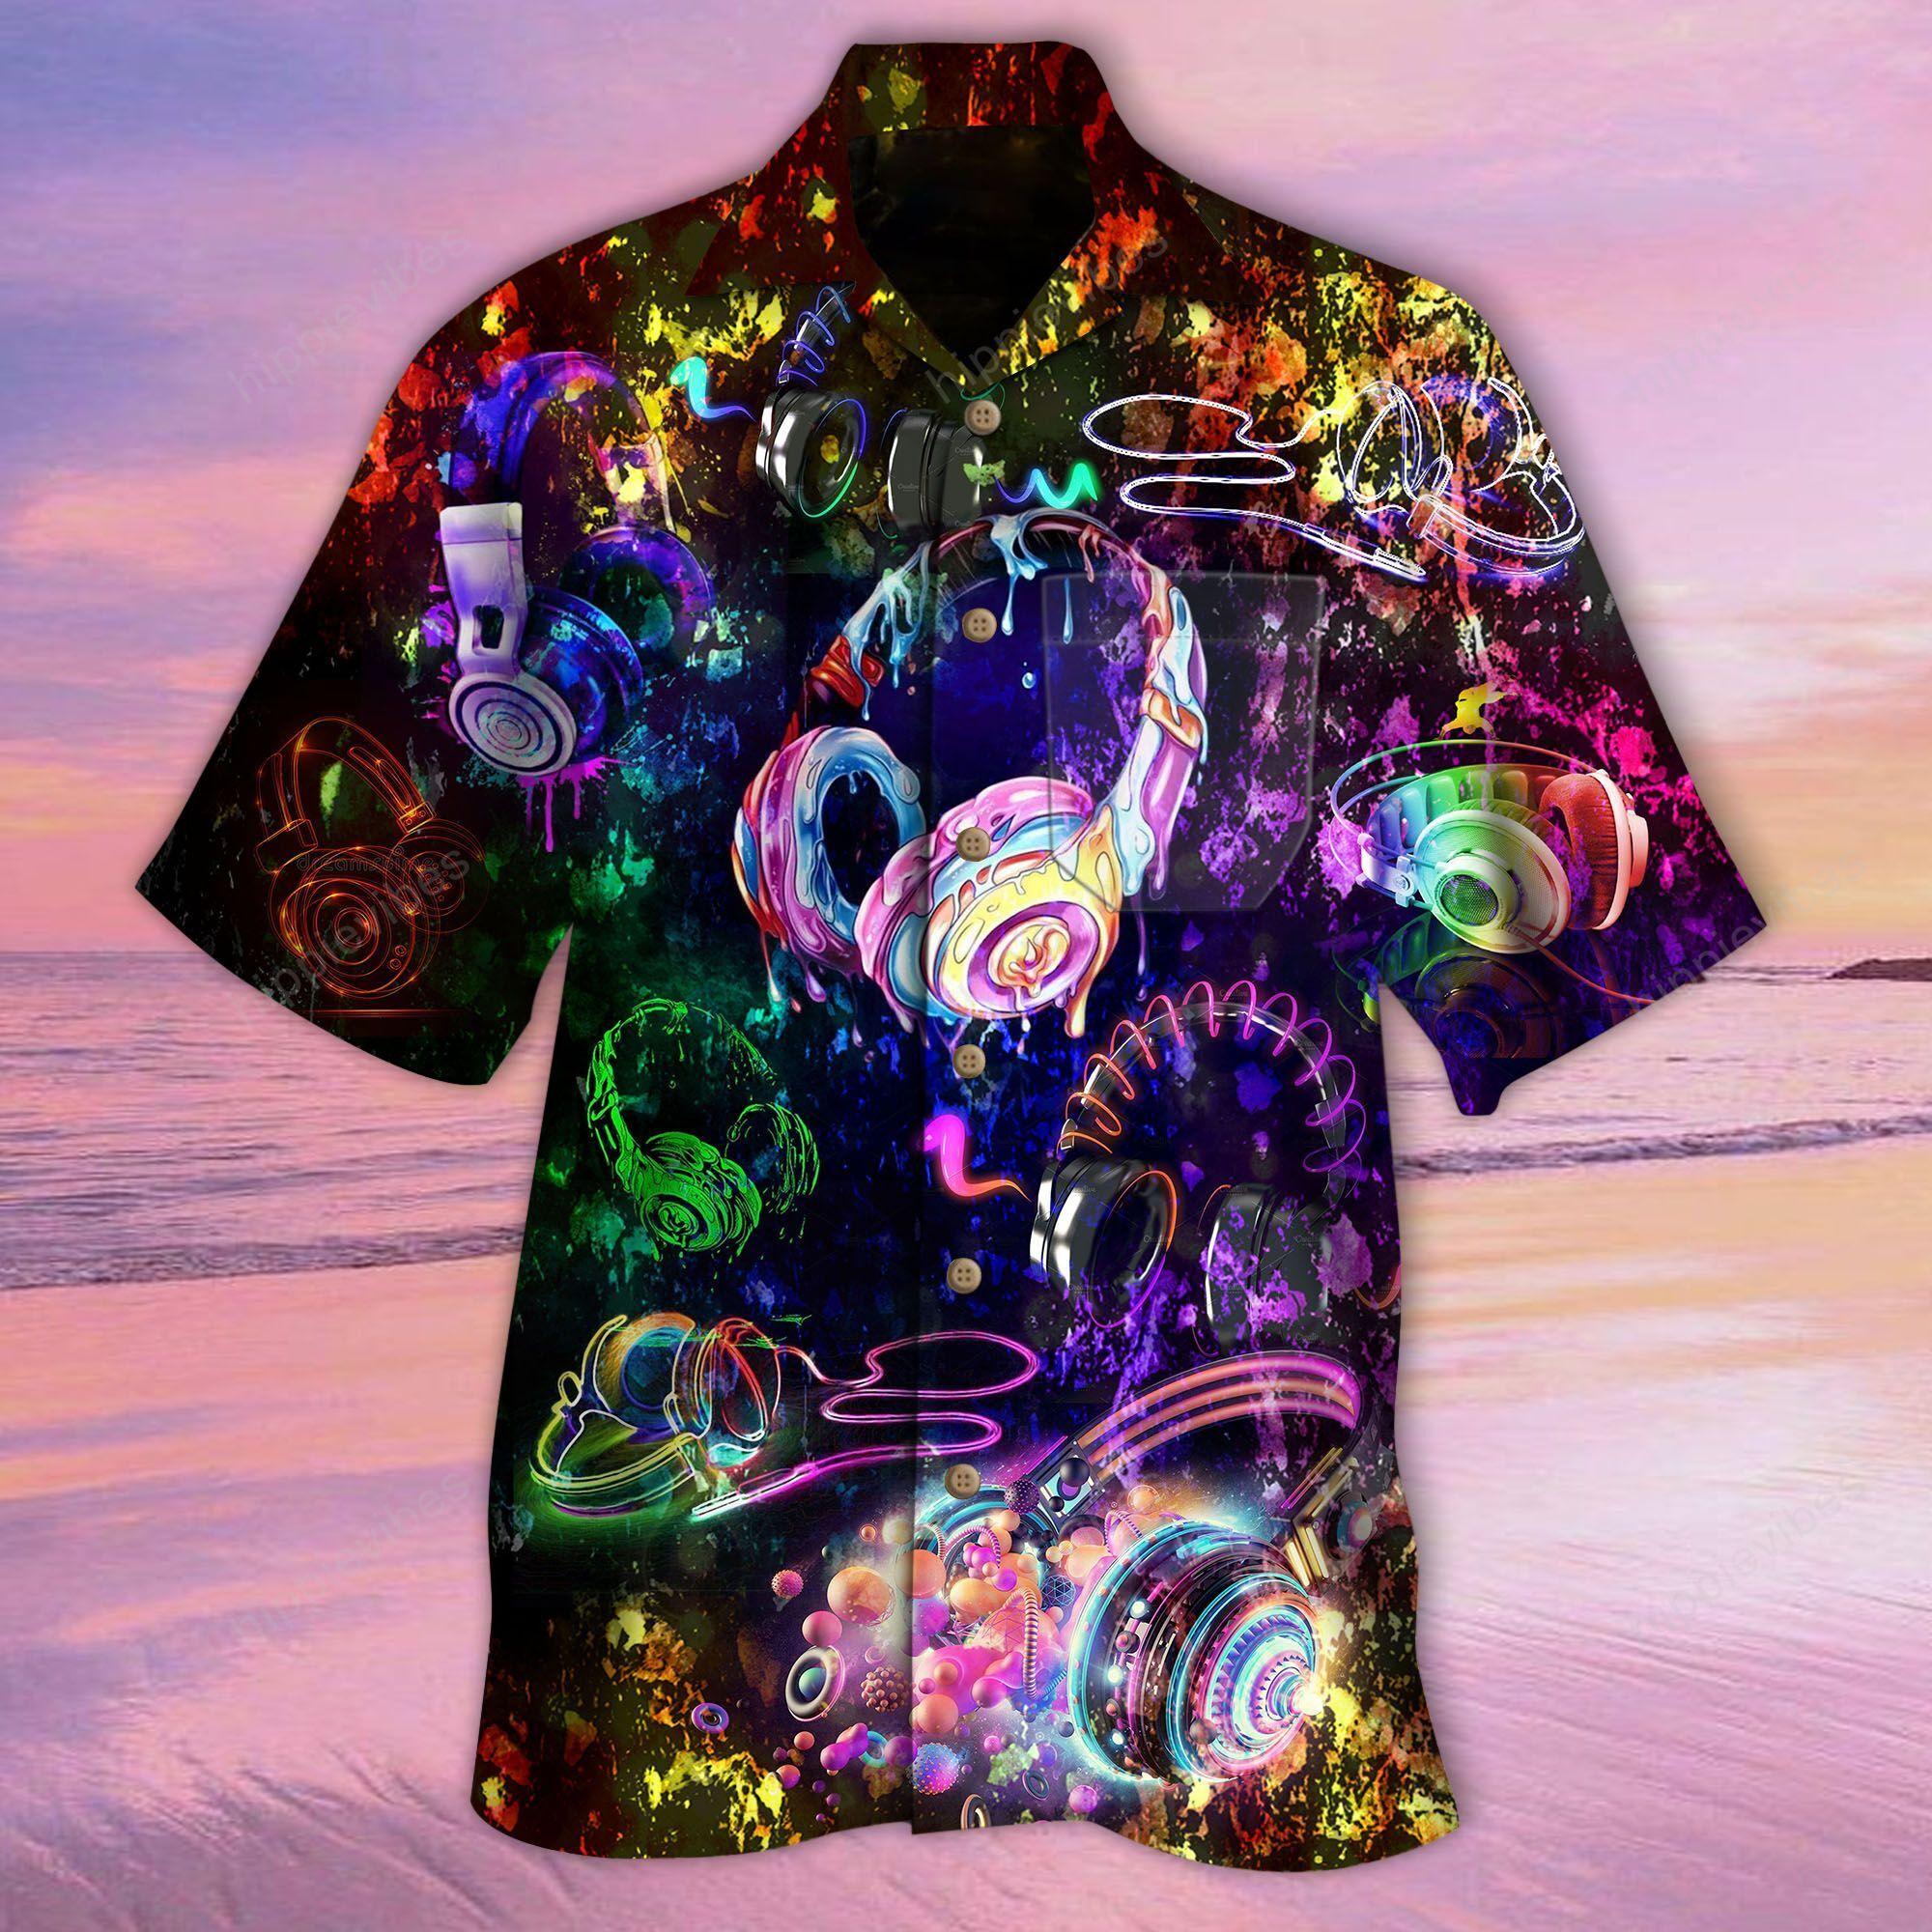 Amazing Headphone Colorful Hawaiian Shirt